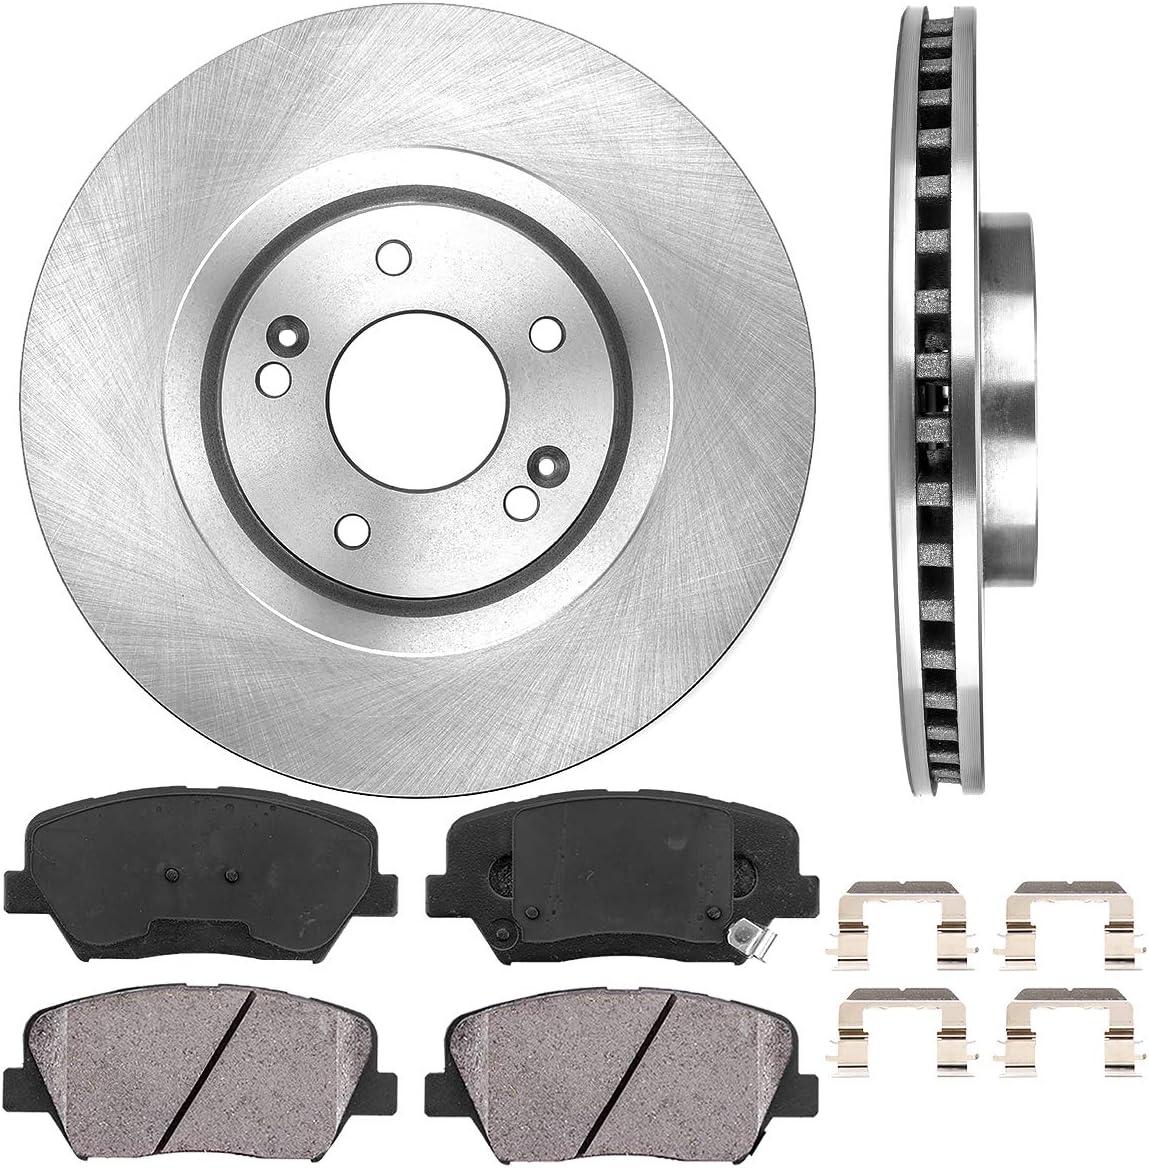 Hardware 4 Callahan FRONT 320 mm Premium OE 5 Lug Brake Rotors + CRK01555 2 Ceramic Brake Pads